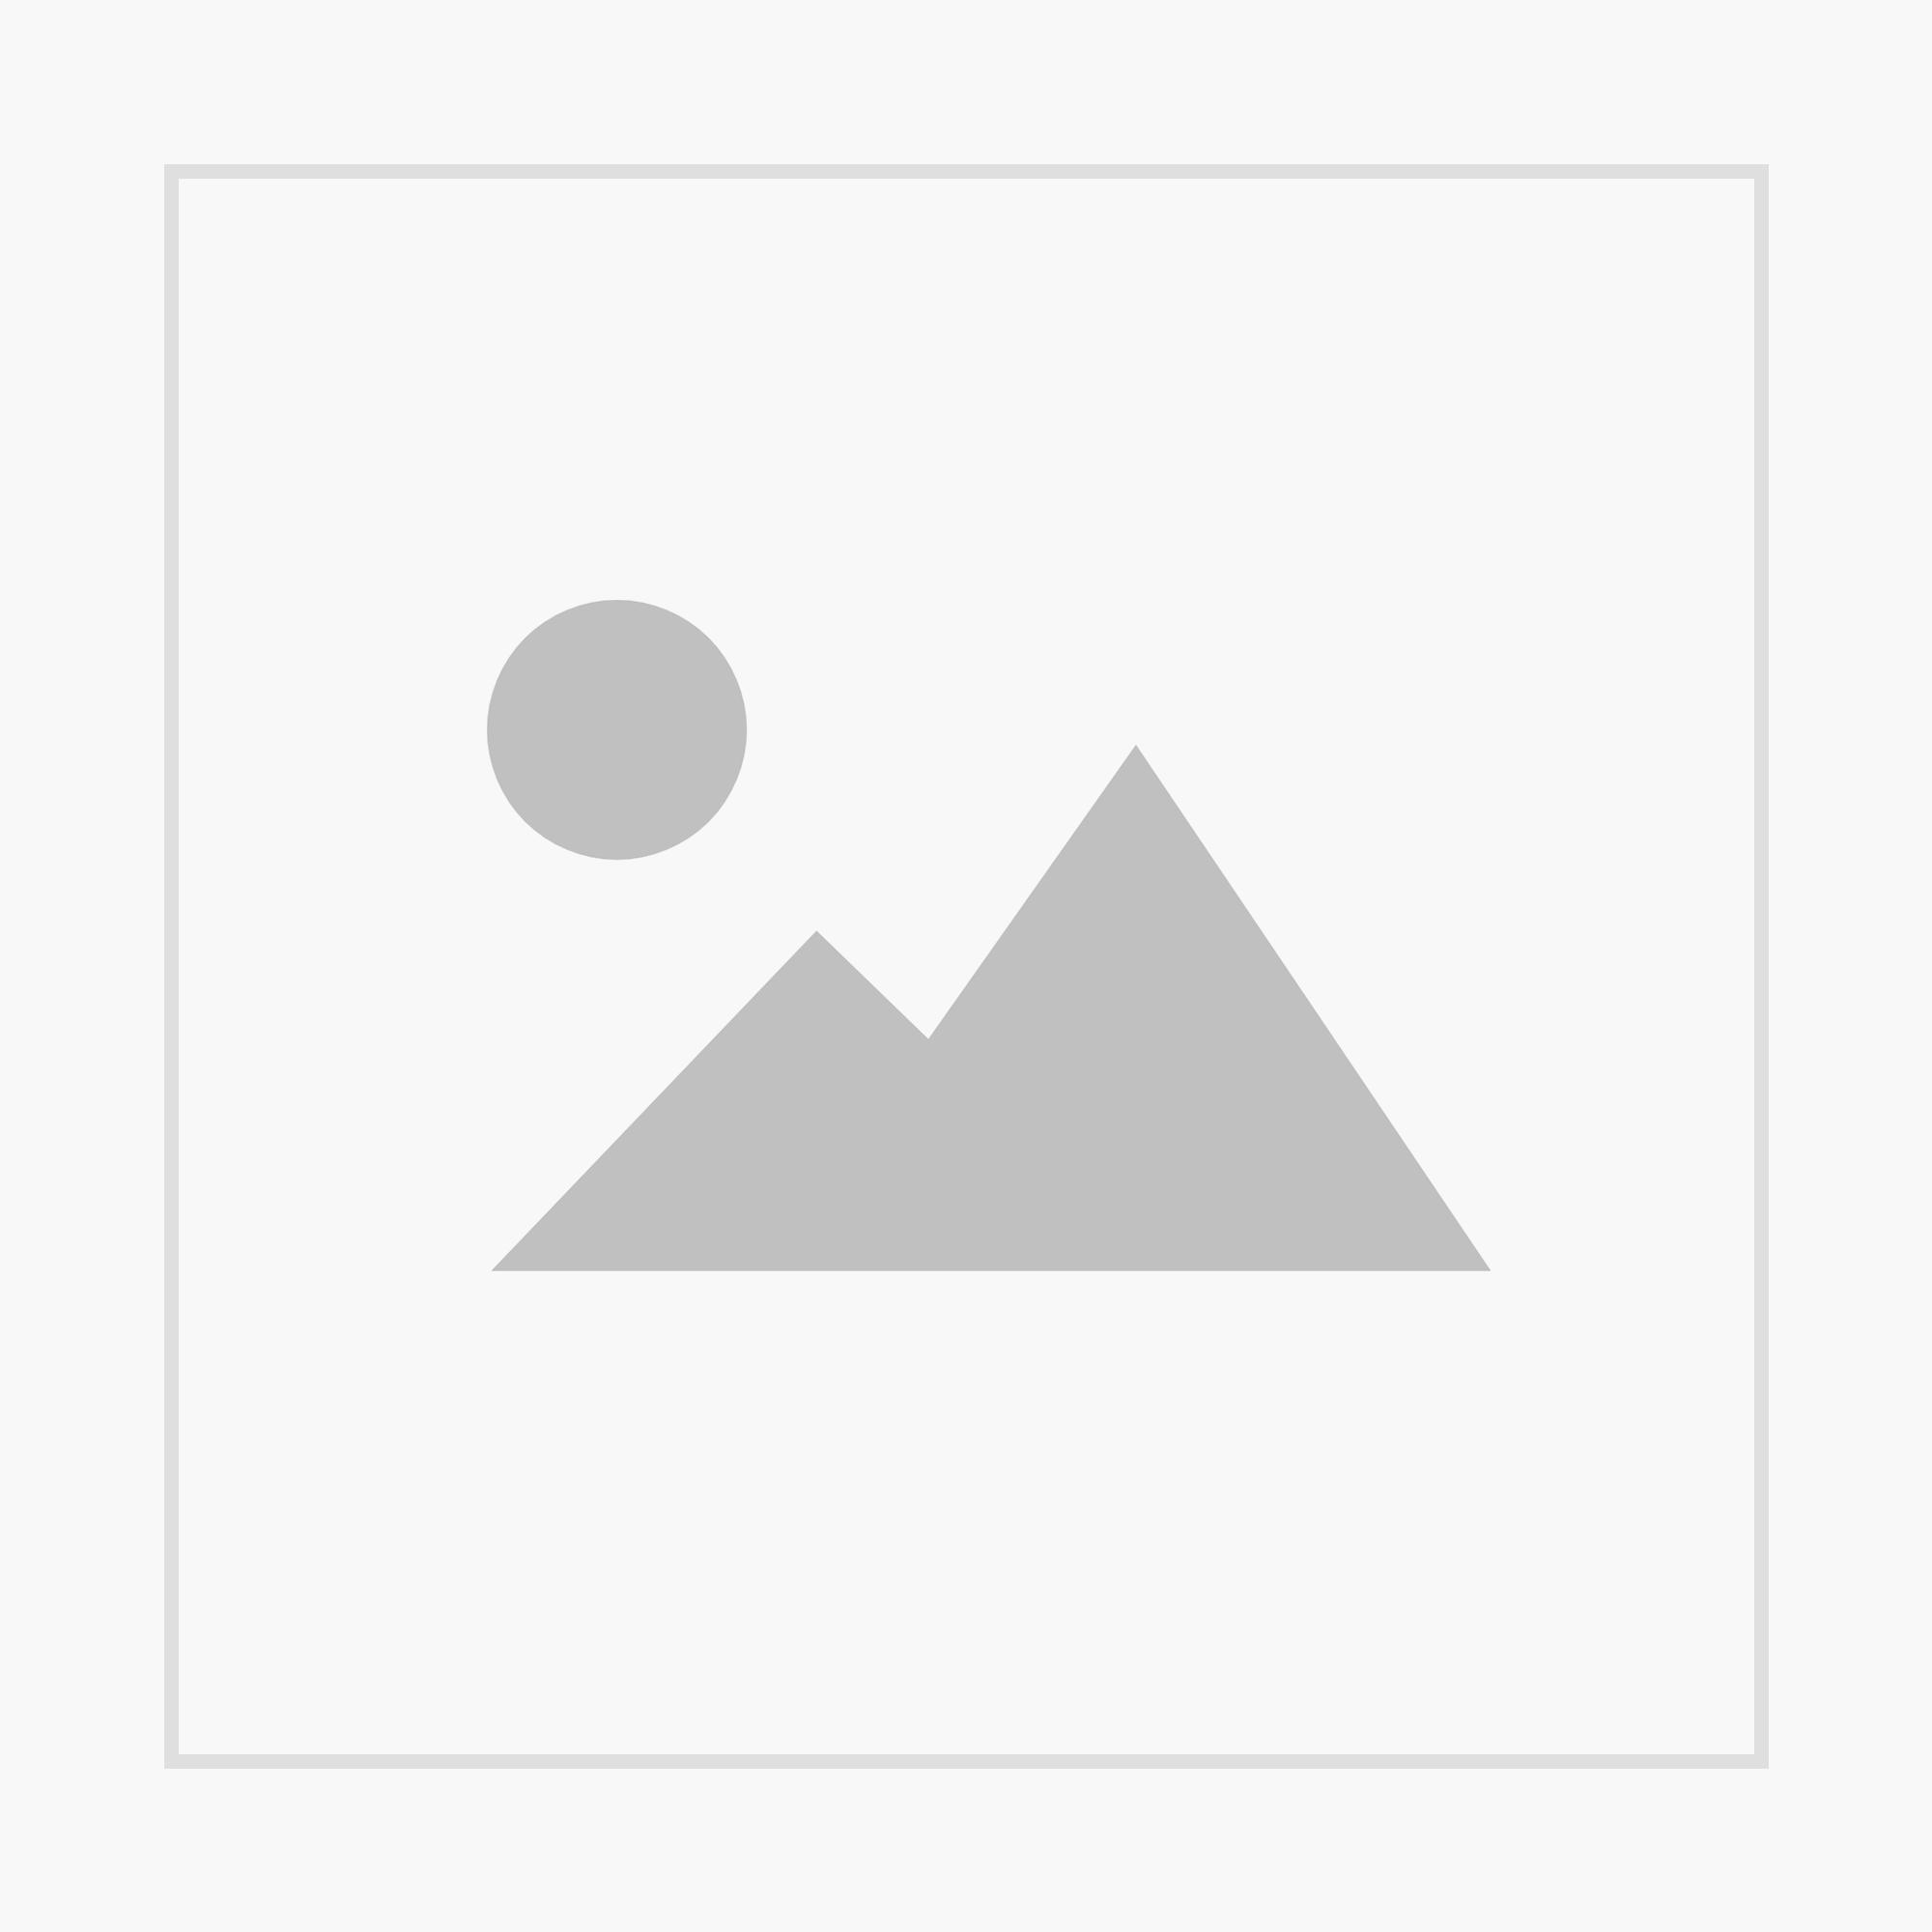 PDF: NaBiV Heft 166: Naturschutzrechtliche Steuerungspotenziale des Gebietsschutzes - Schwerpunkt Landschaftsschutzgebiete